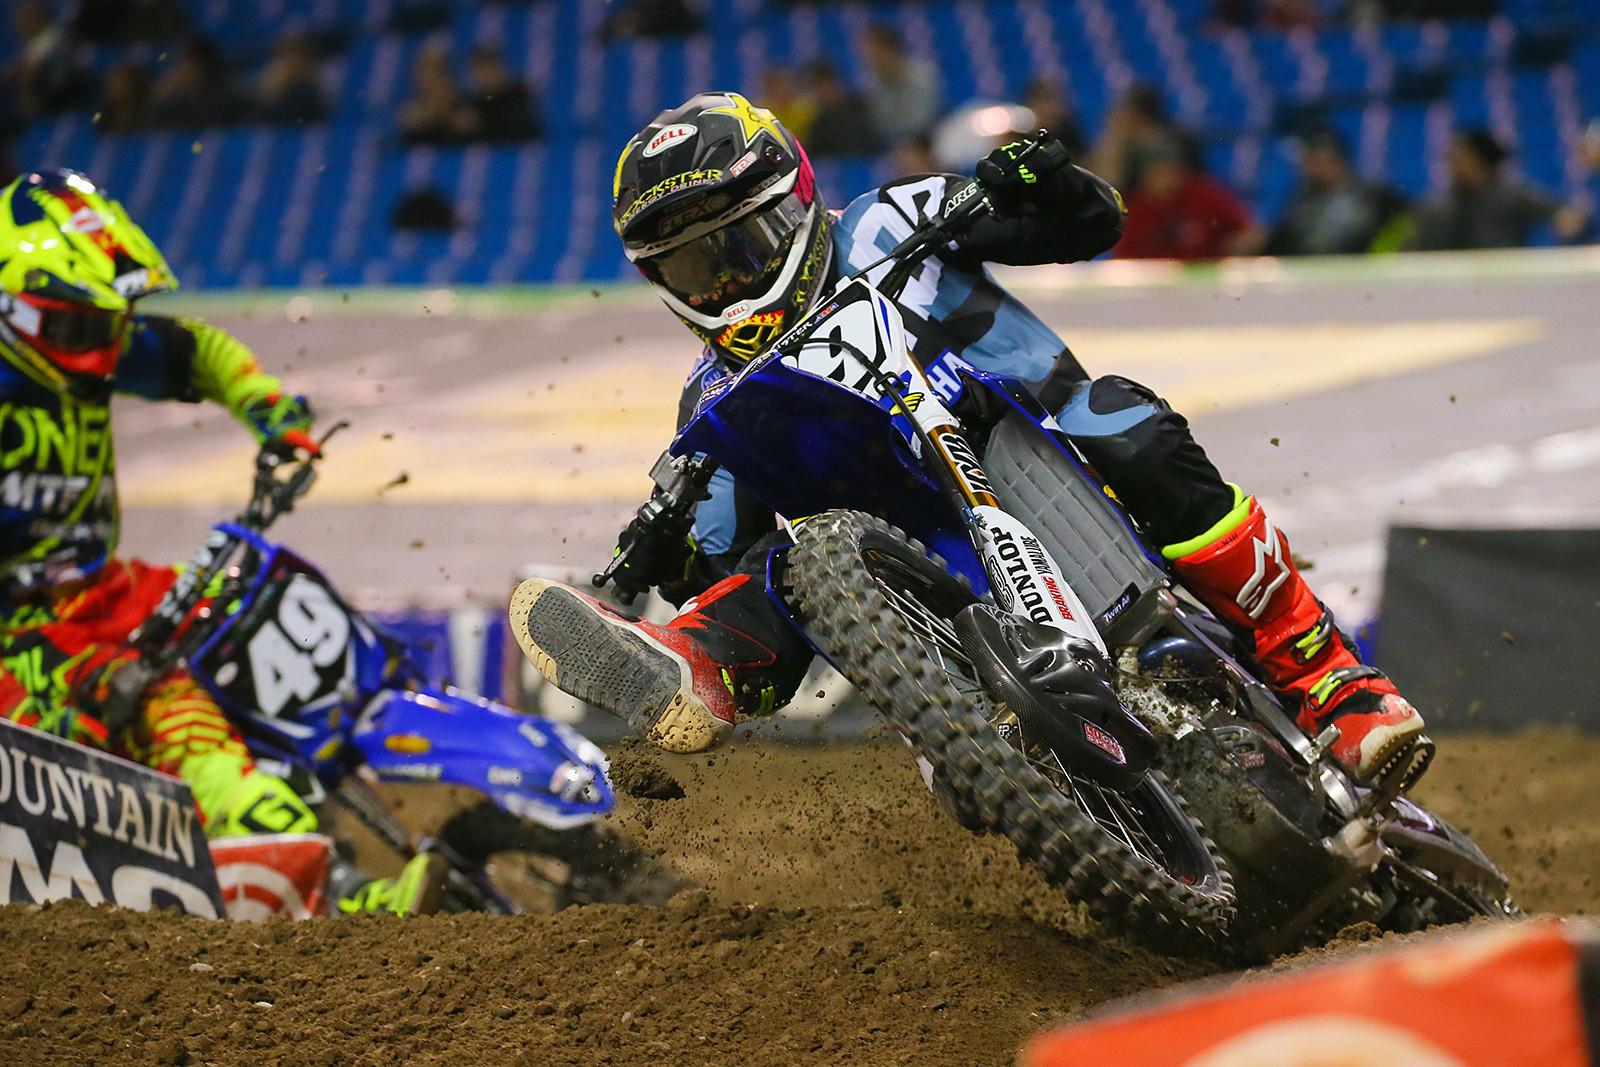 Colt Nichols Breaks Arm in Practice Crash